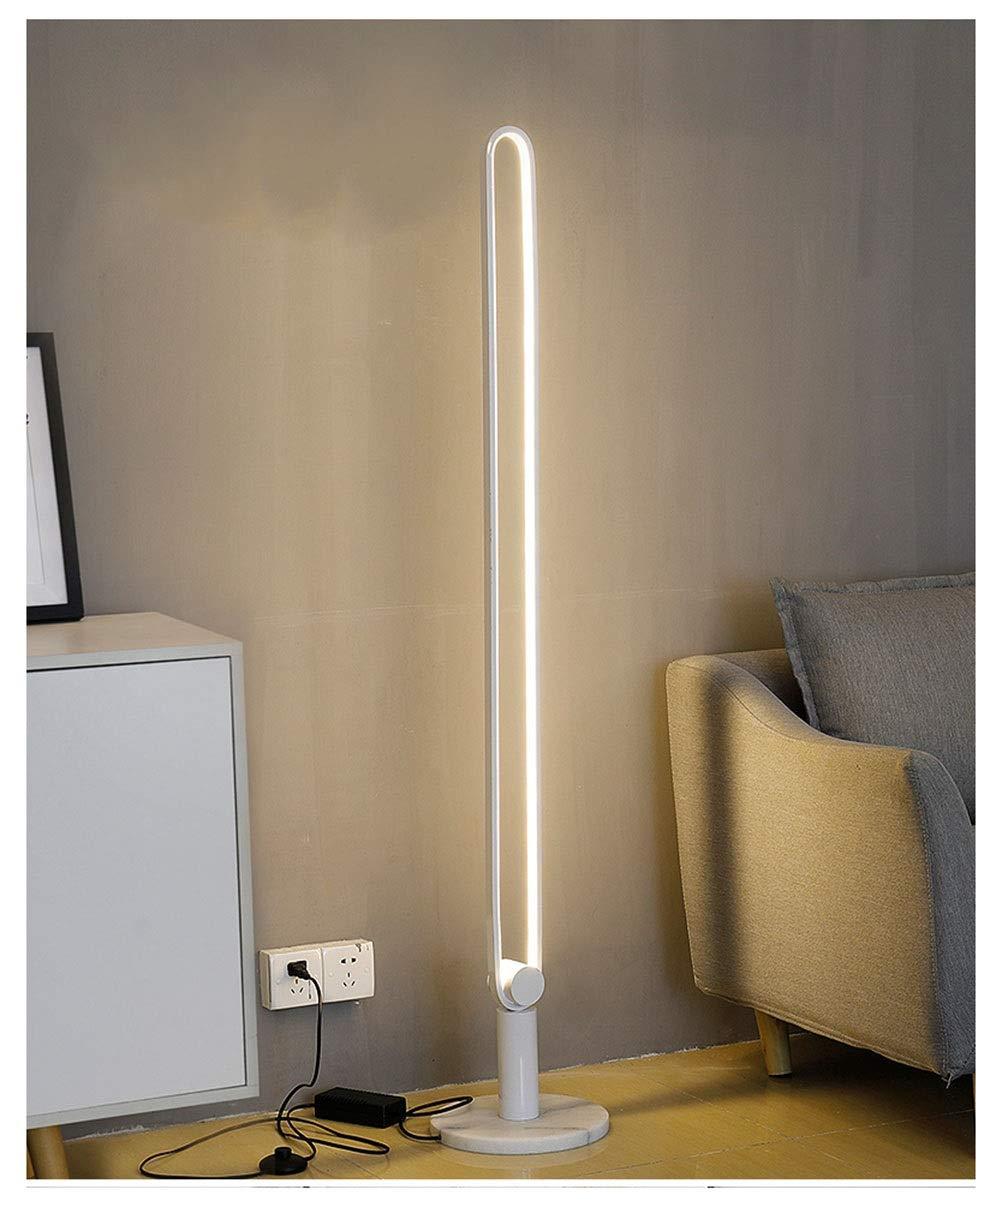 ZCYX フロアランプの寝室のリビングルーム垂直ランプフロアランプ風シンプルモダンフロアスタンドテーブルランプ -623 フロアランプ ランプ B07Q5WJ6LY